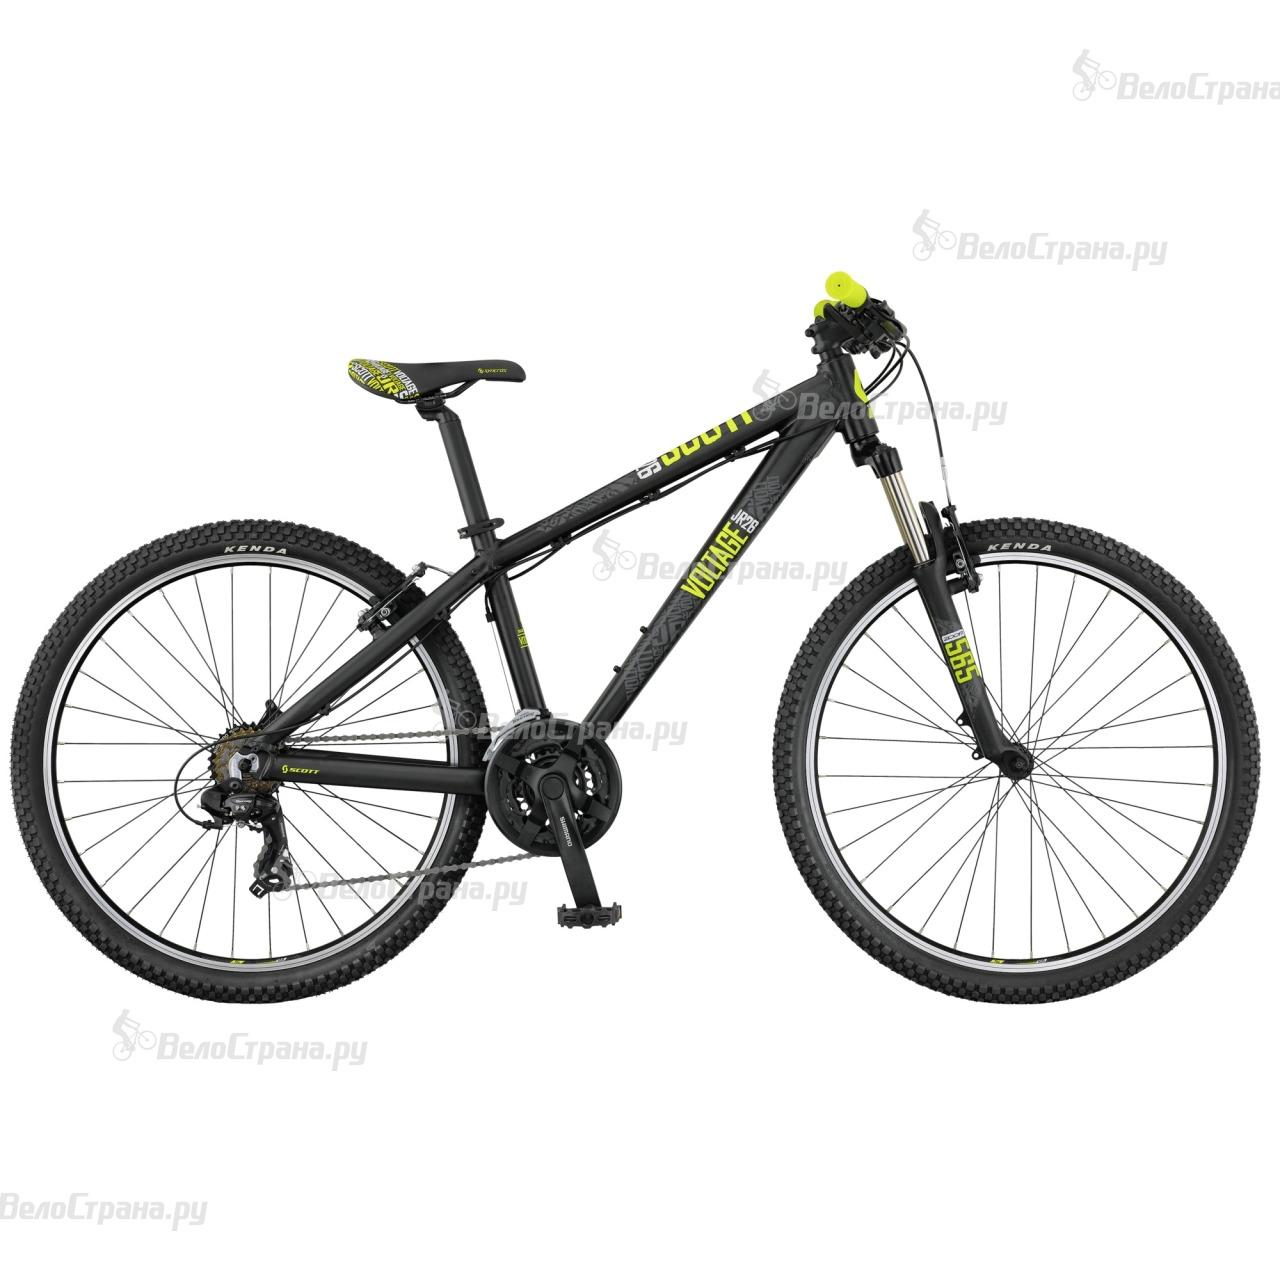 Велосипед Scott Voltage JR 26 (2017)